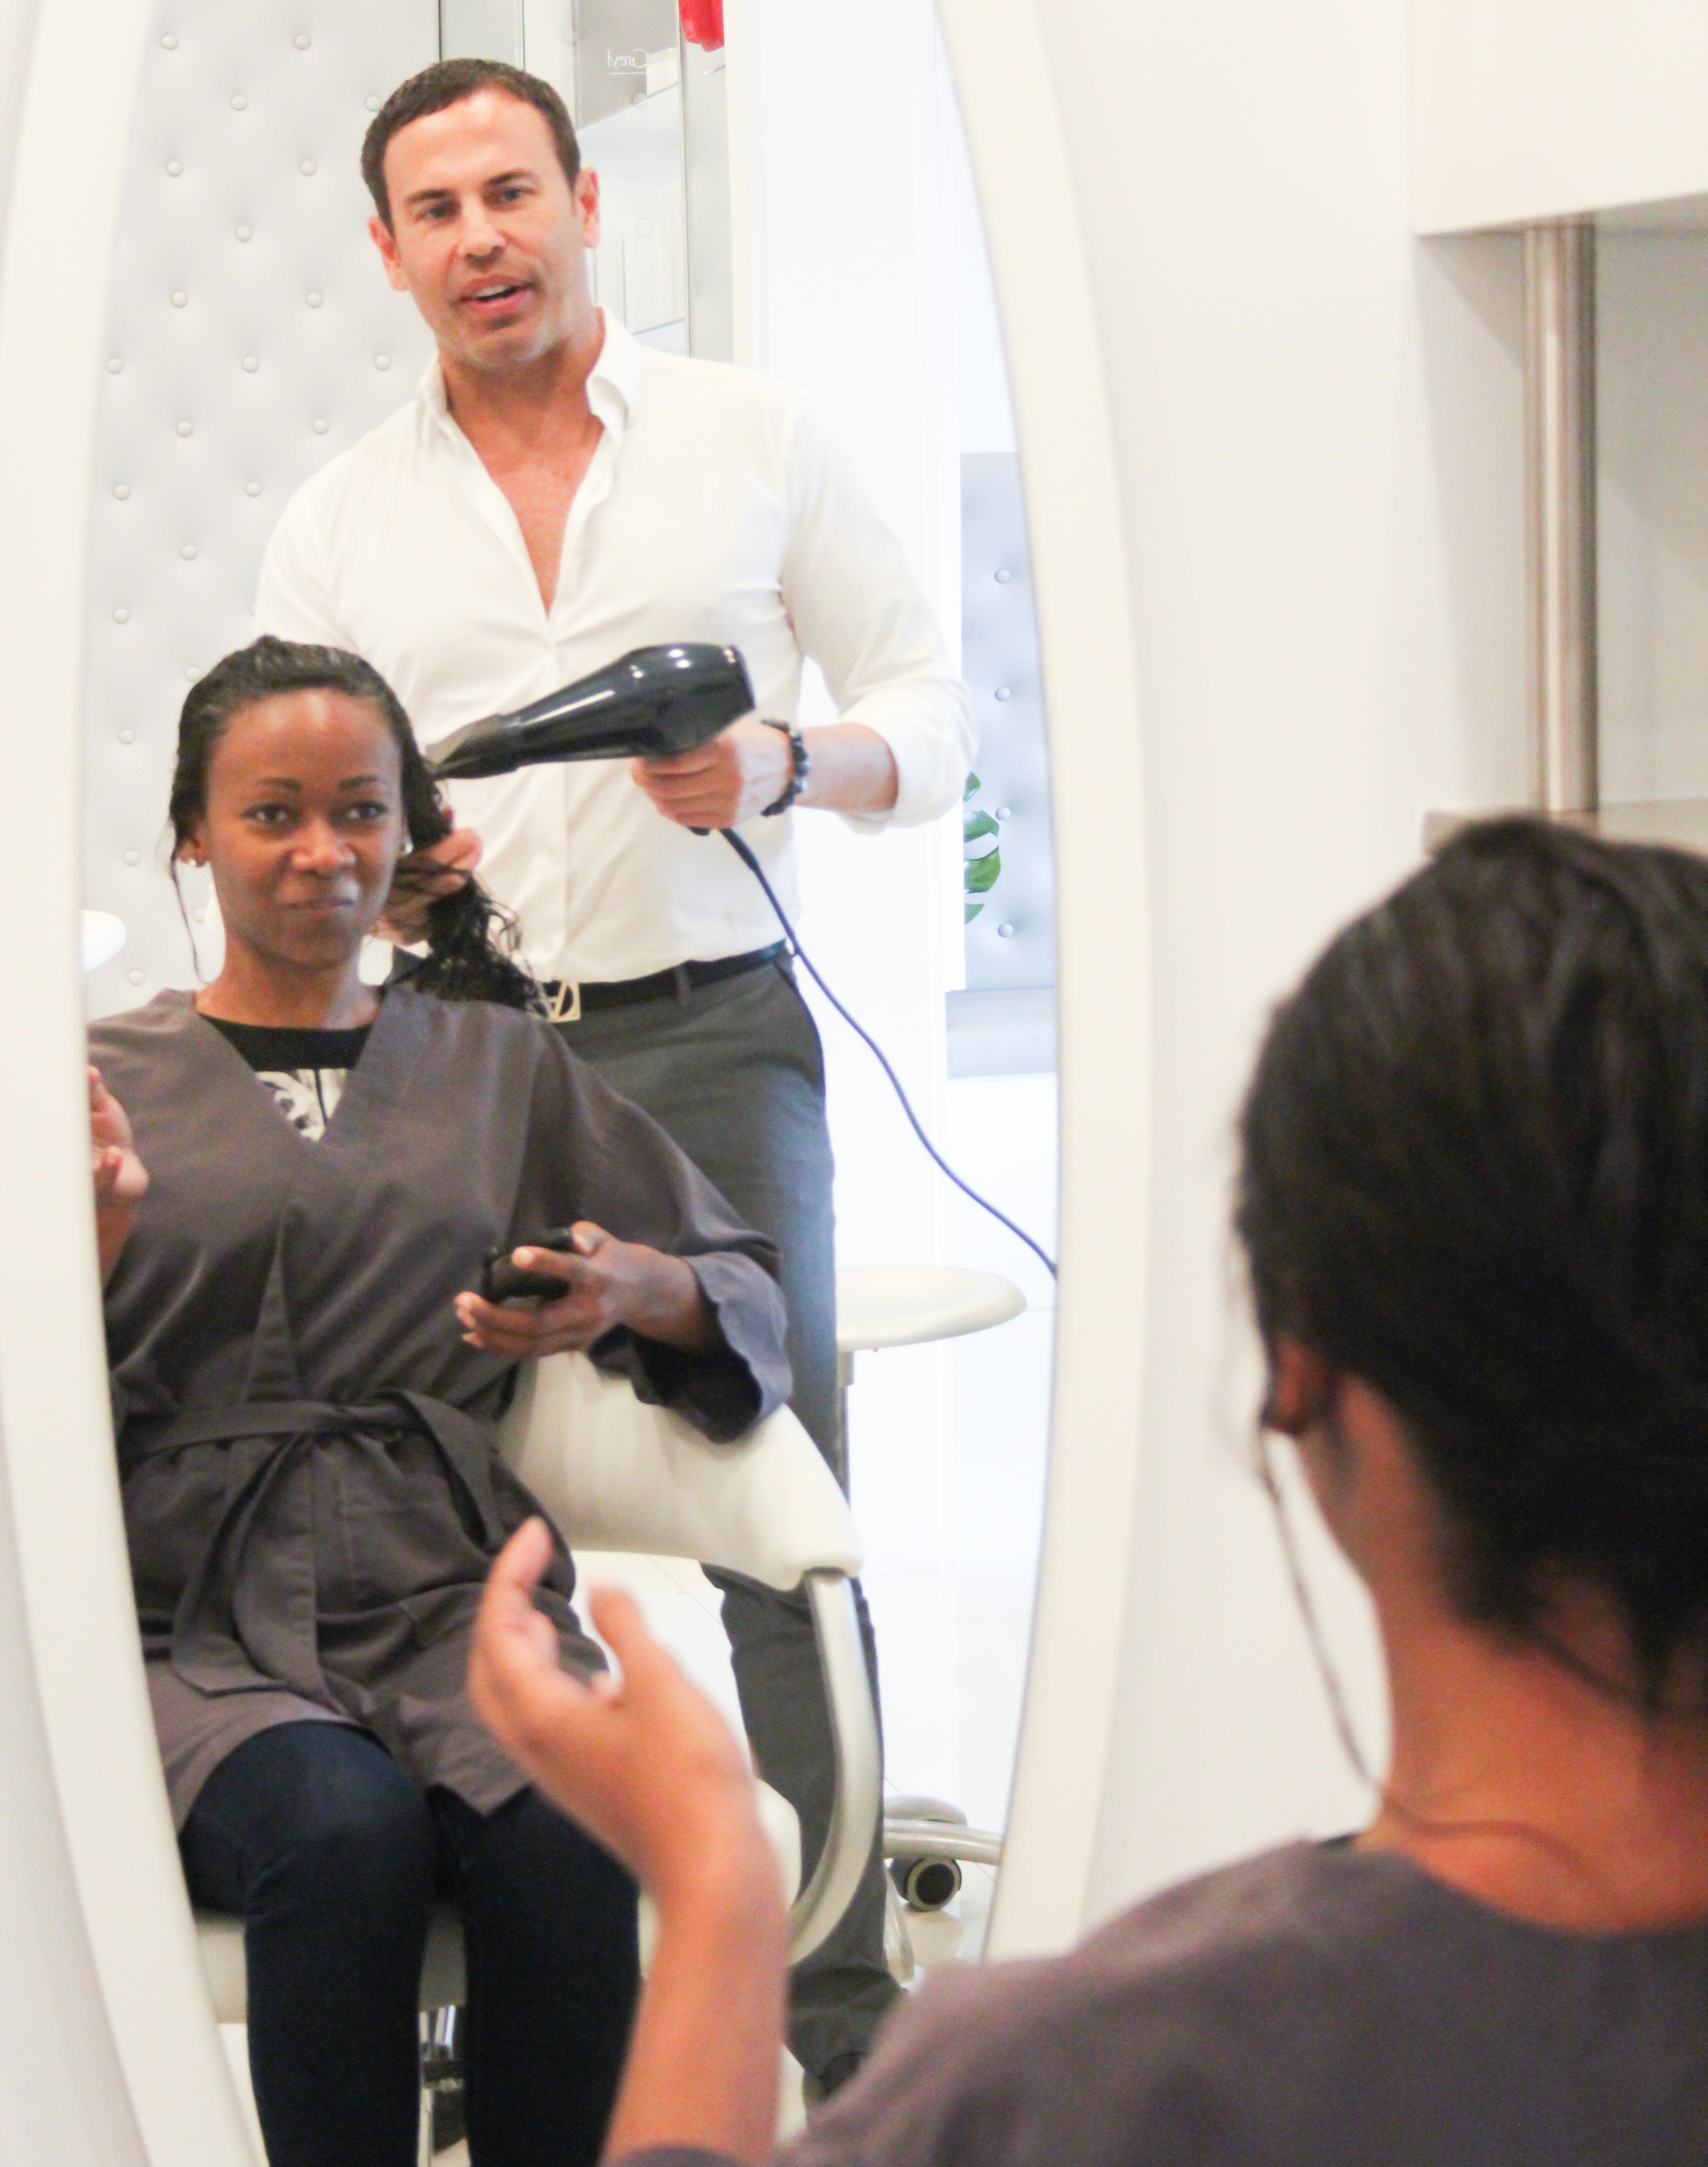 Top 5 Best Hair Salons in Miami - Haute Living